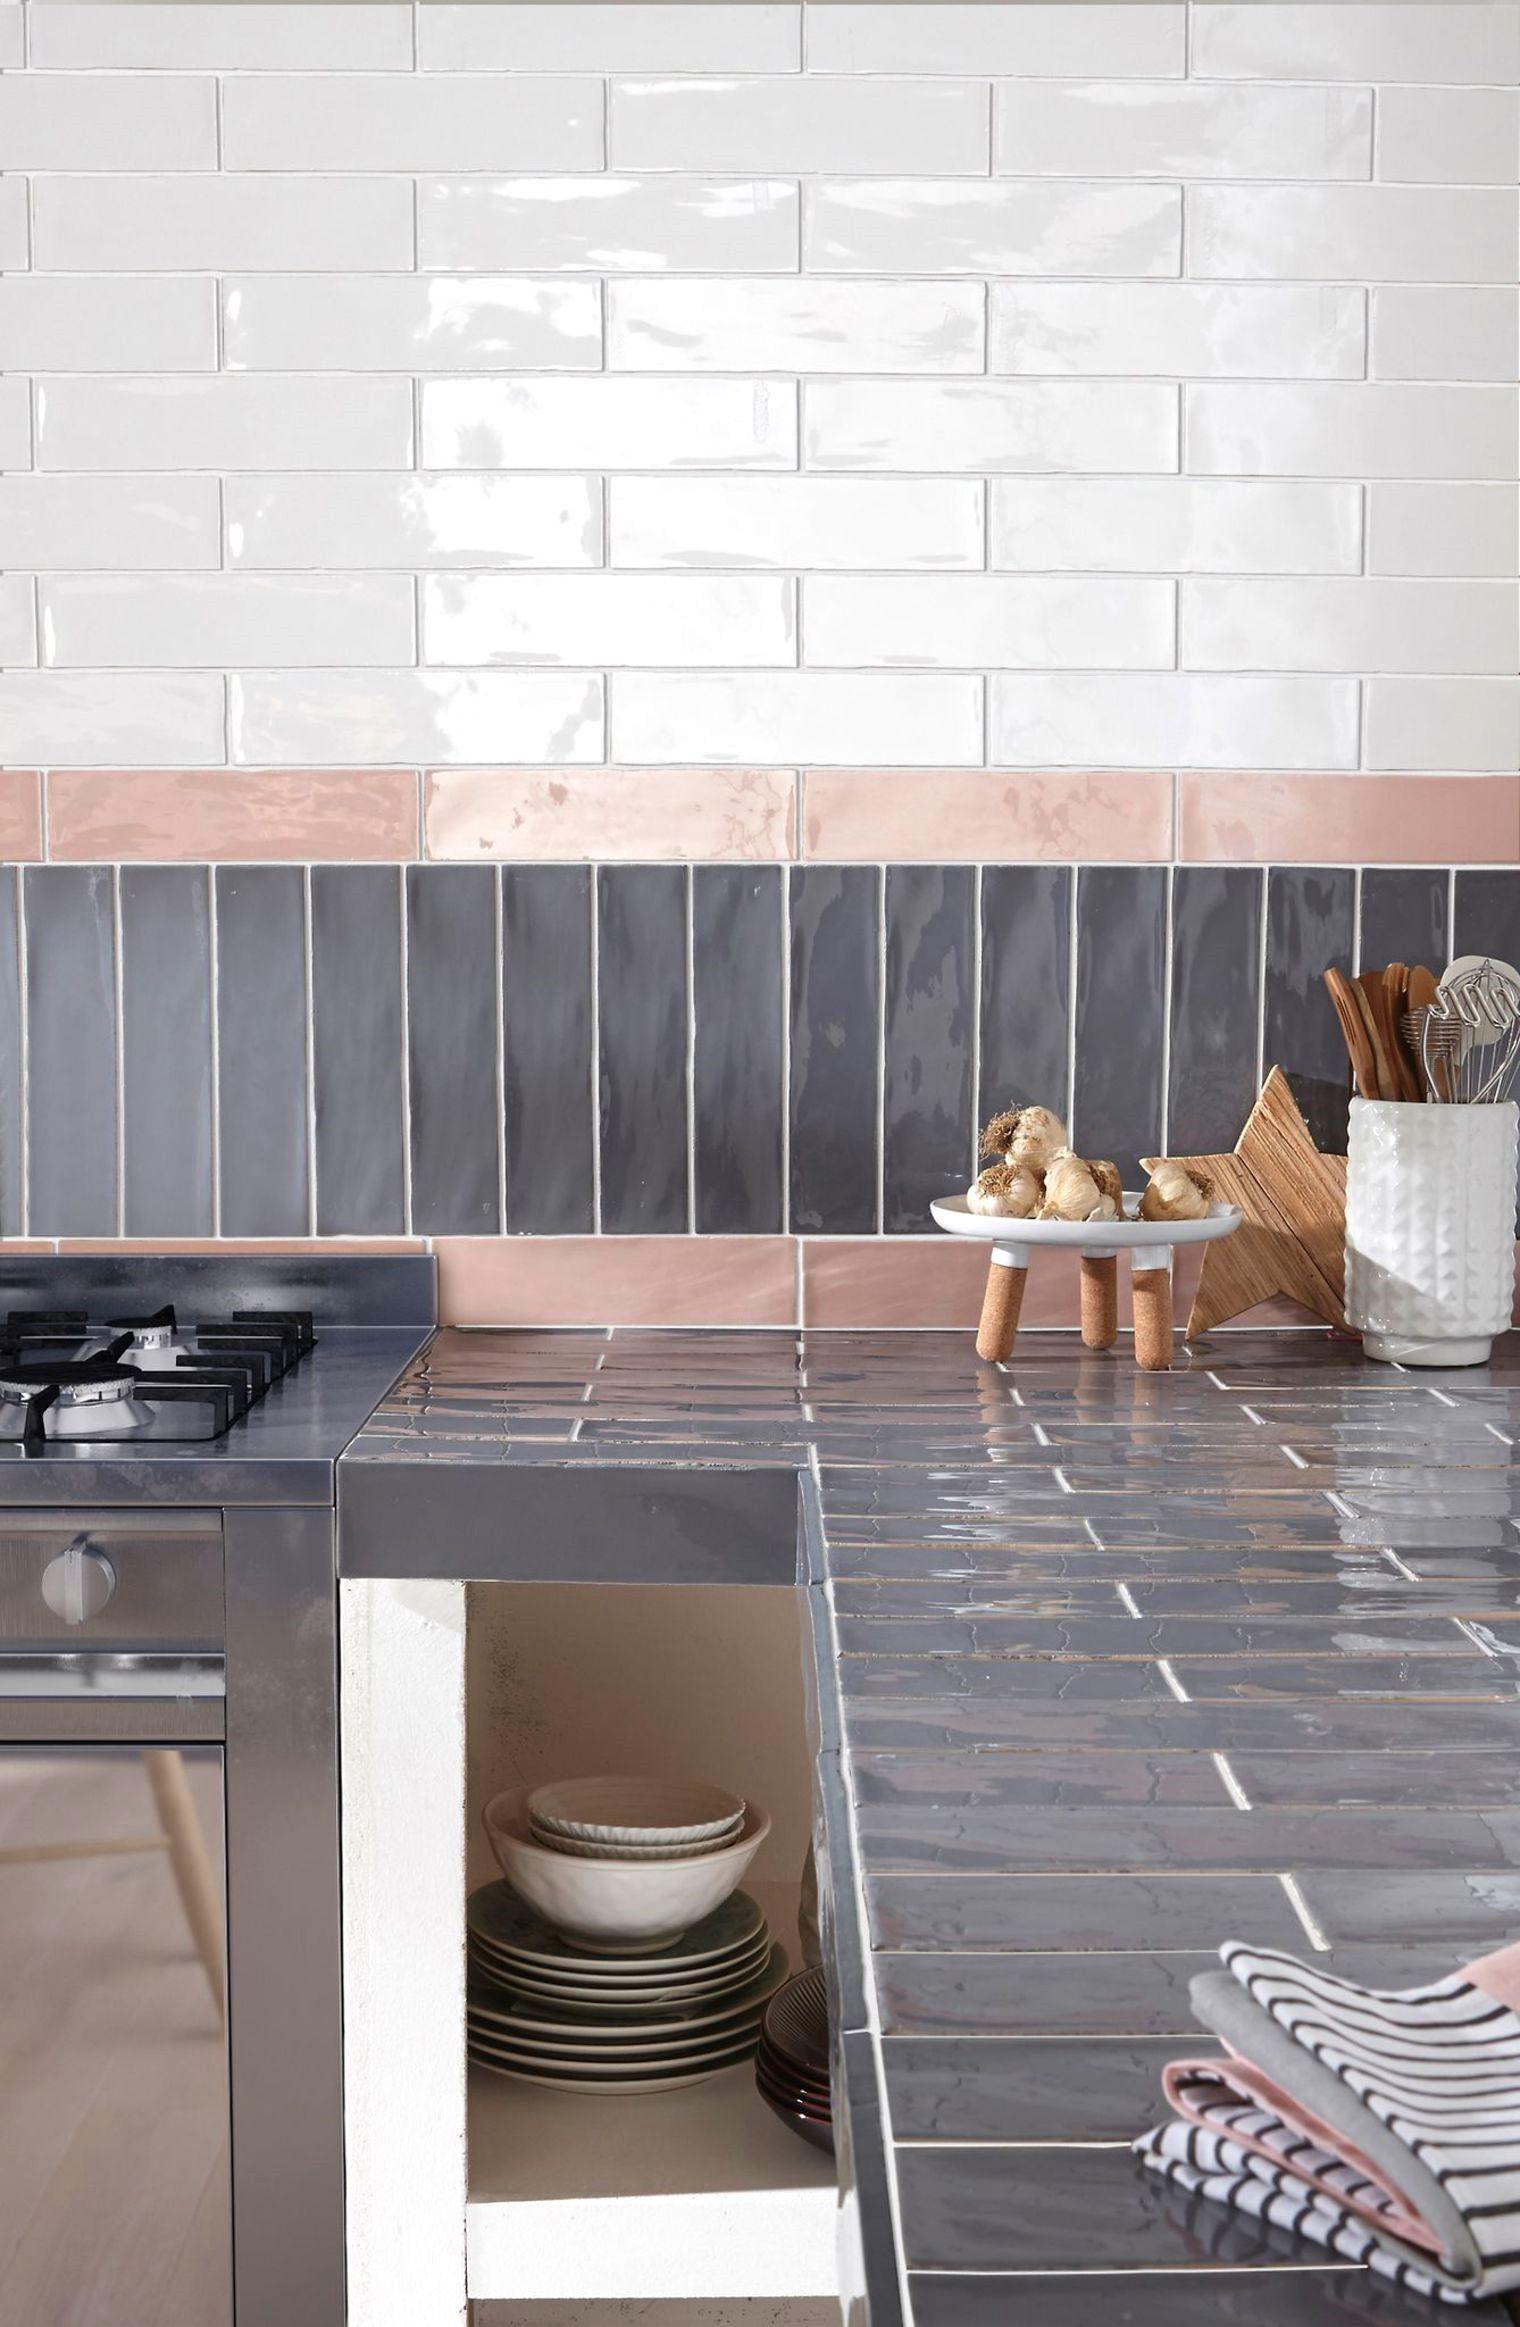 Castorama Cuisine Plan De Travail Gallery Check More At Https Hdwallpaperss Com Castorama Cuisine Plan De Travail In 2020 Keuken Huis